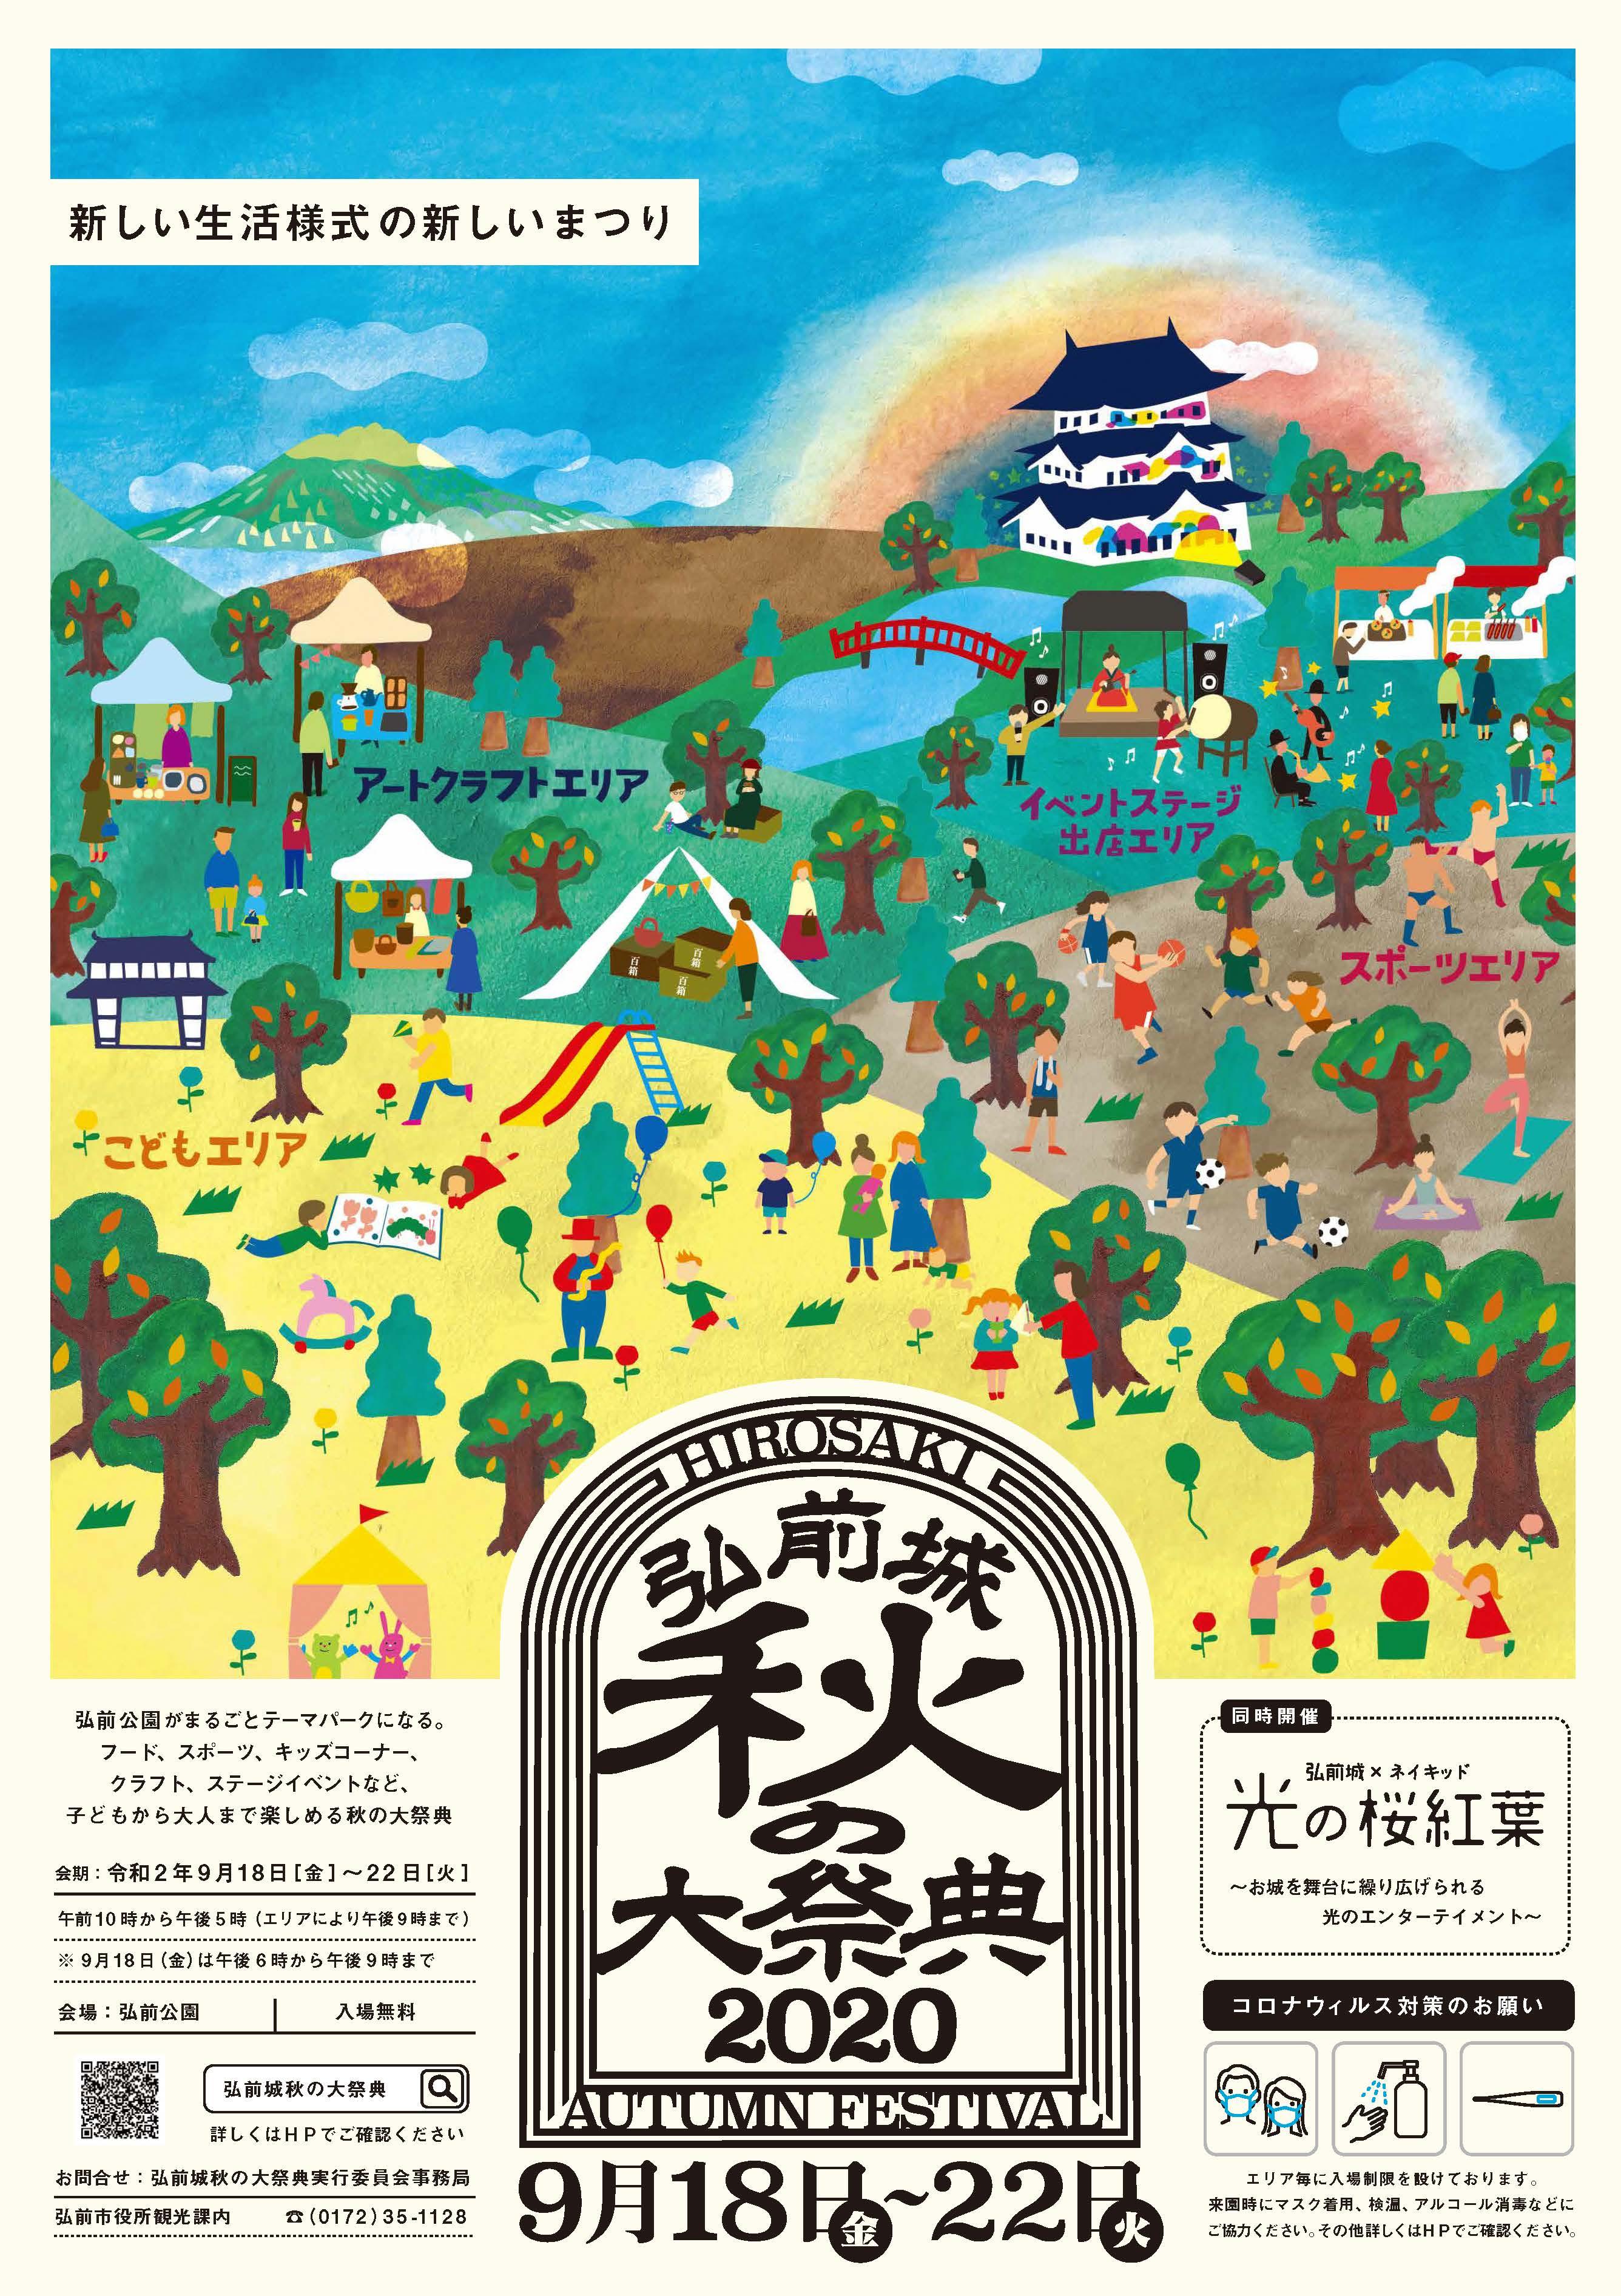 弘前城秋の大祭典